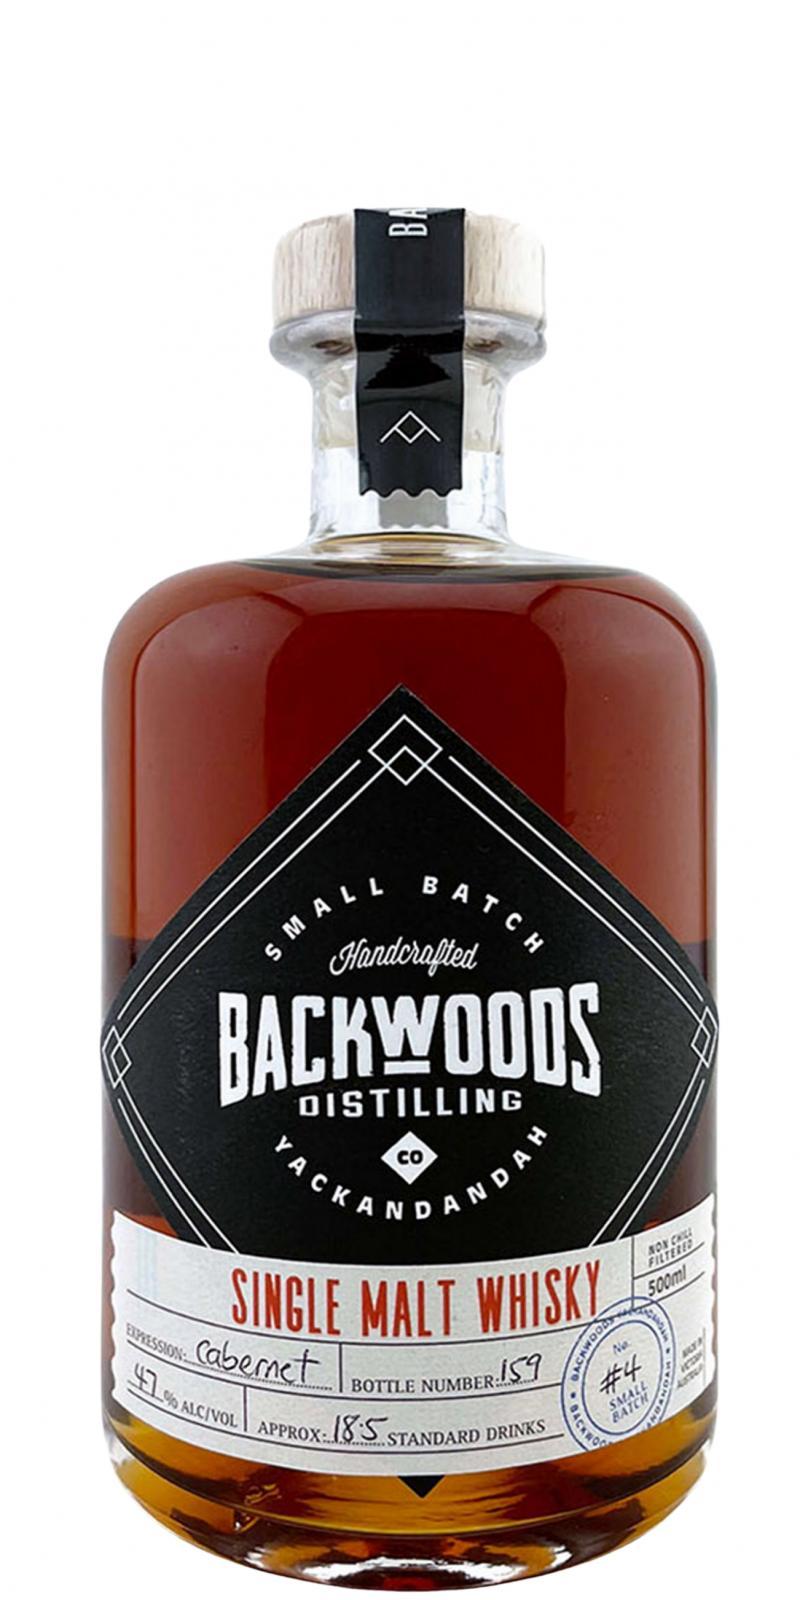 Backwoods Distilling Single Malt Whisky